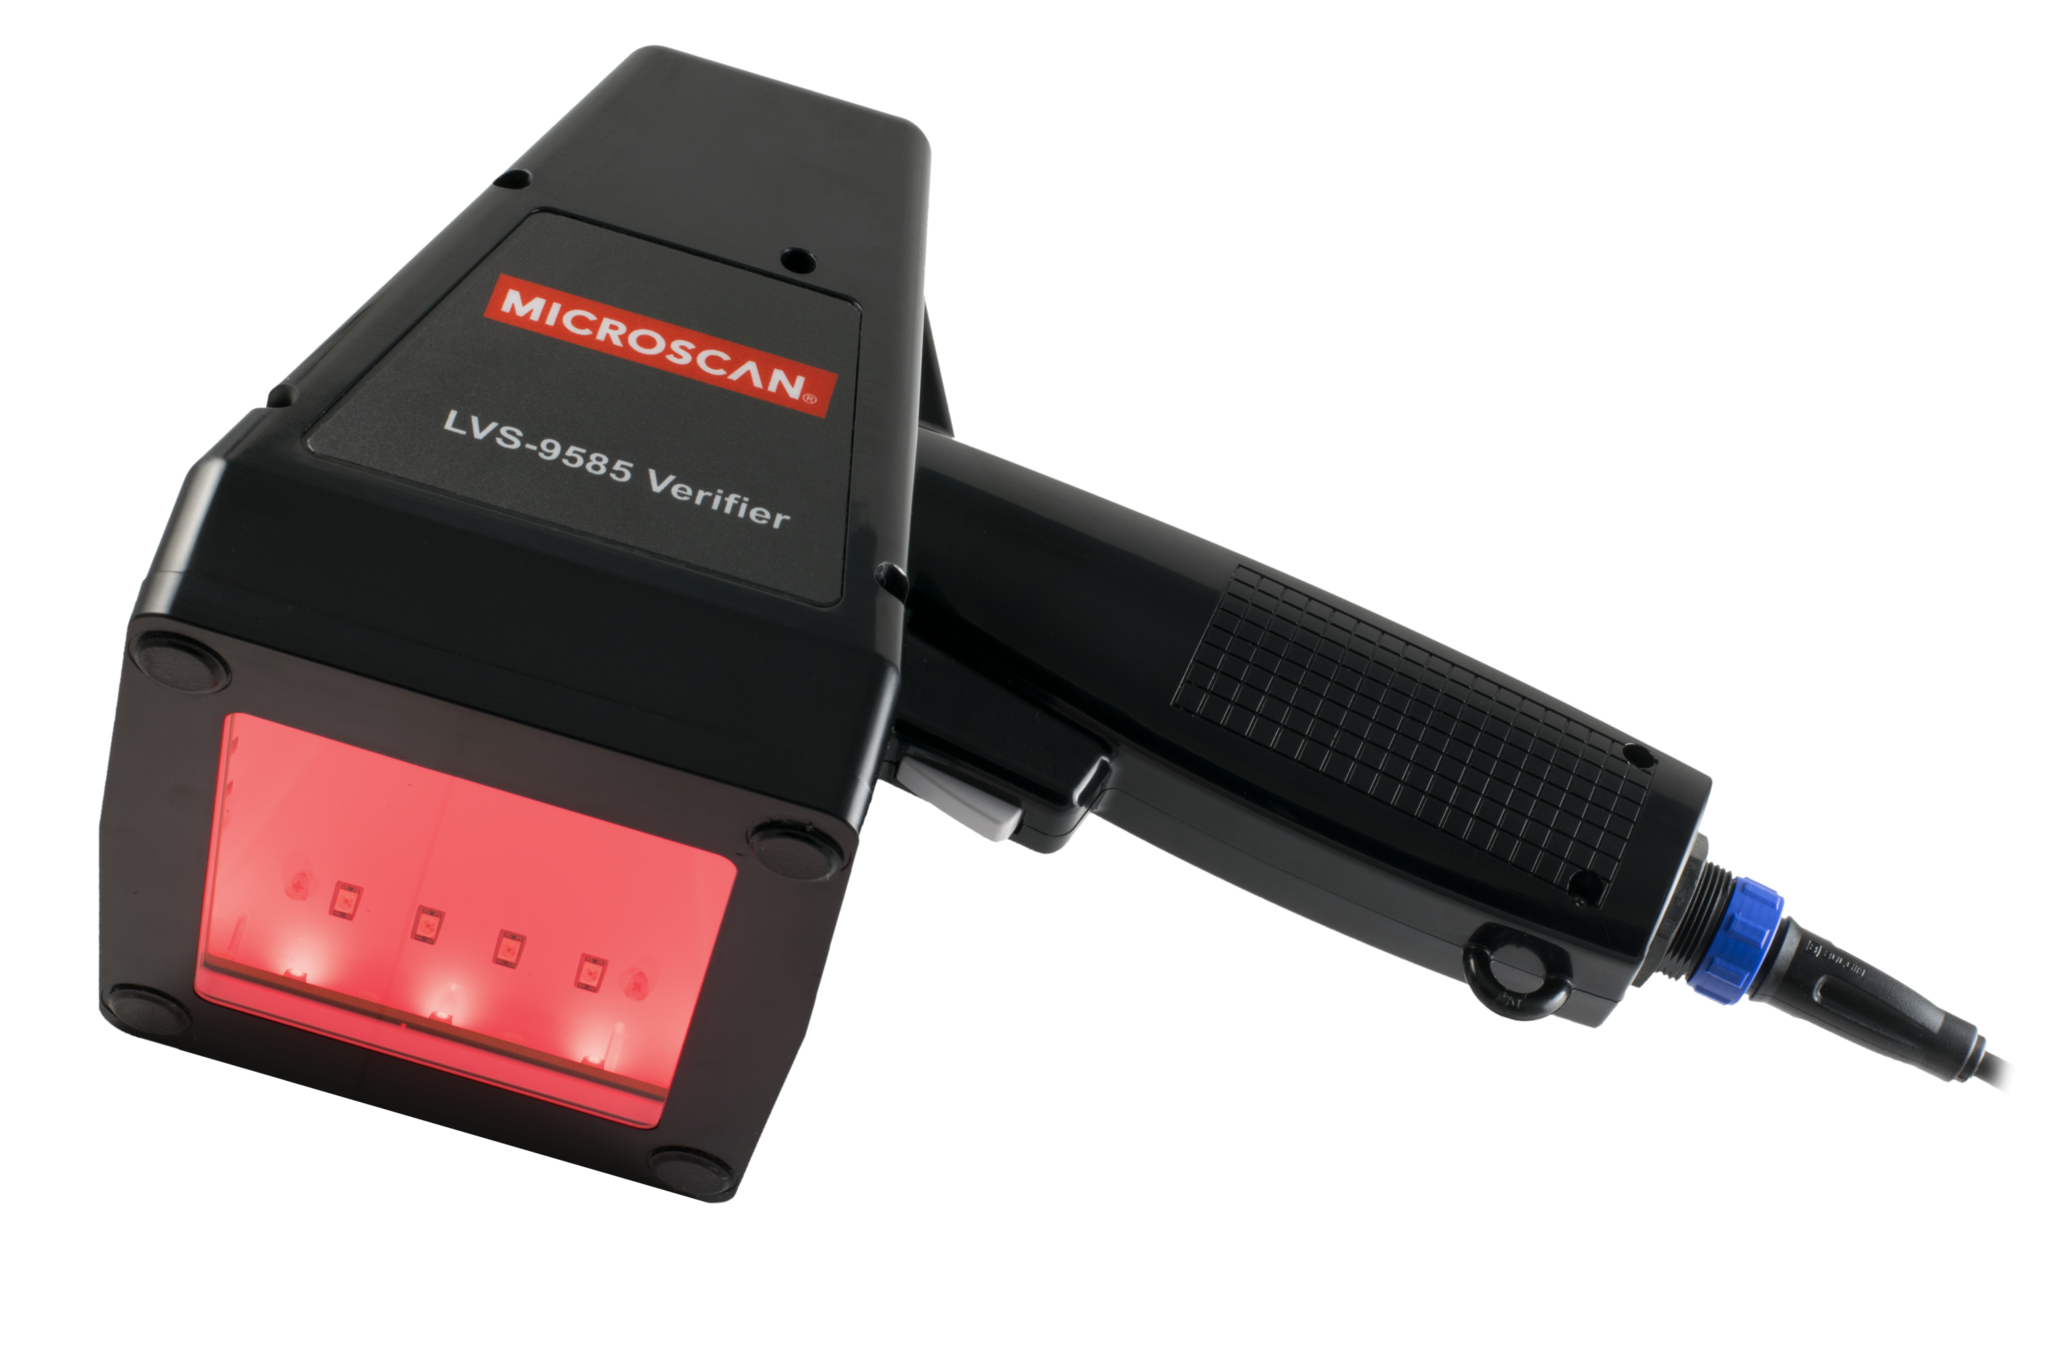 LVS® 9585 Handheld Barcode Verifier